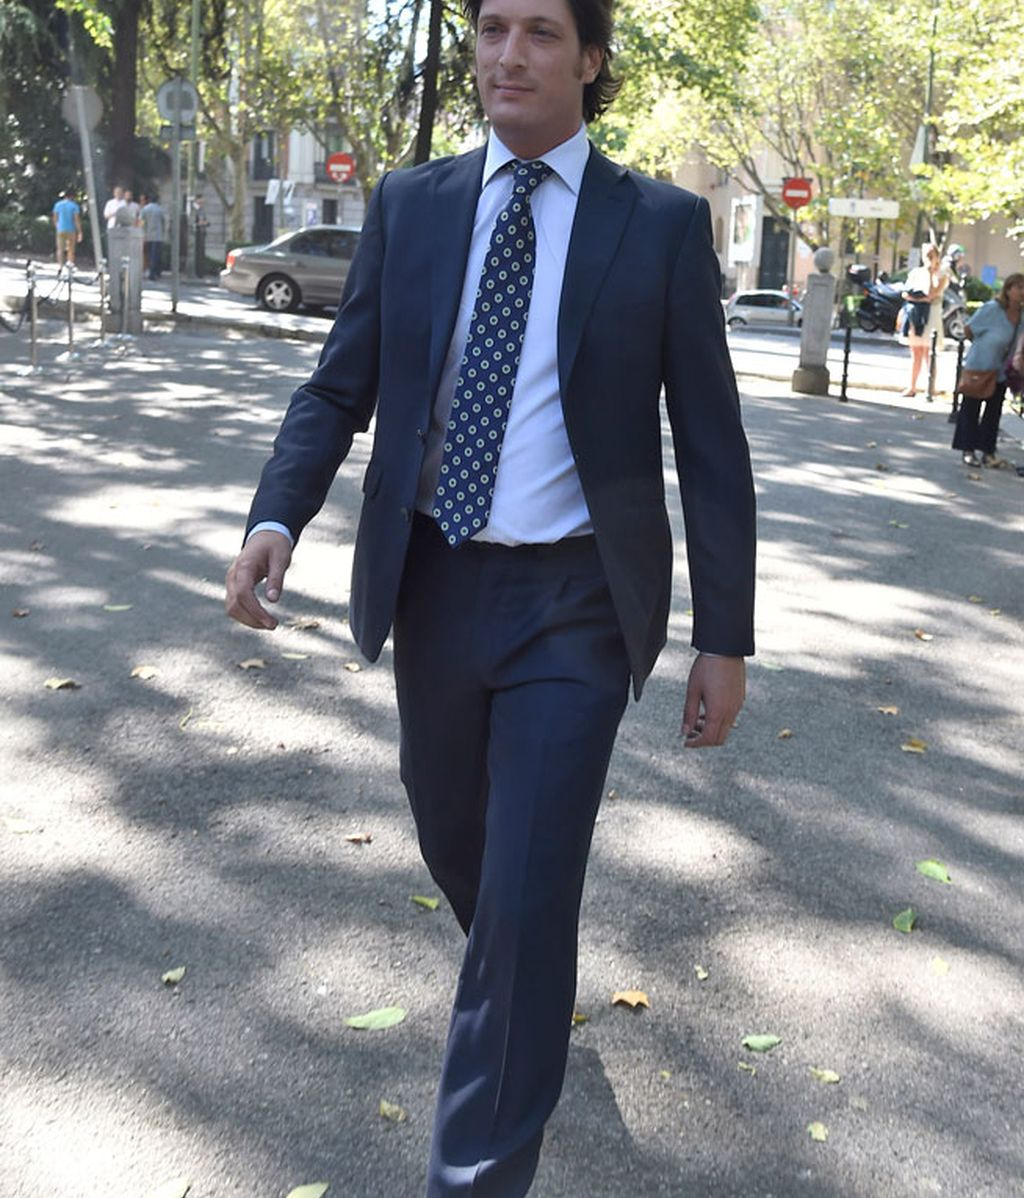 Luis Medina Abascal, de traje oscuro